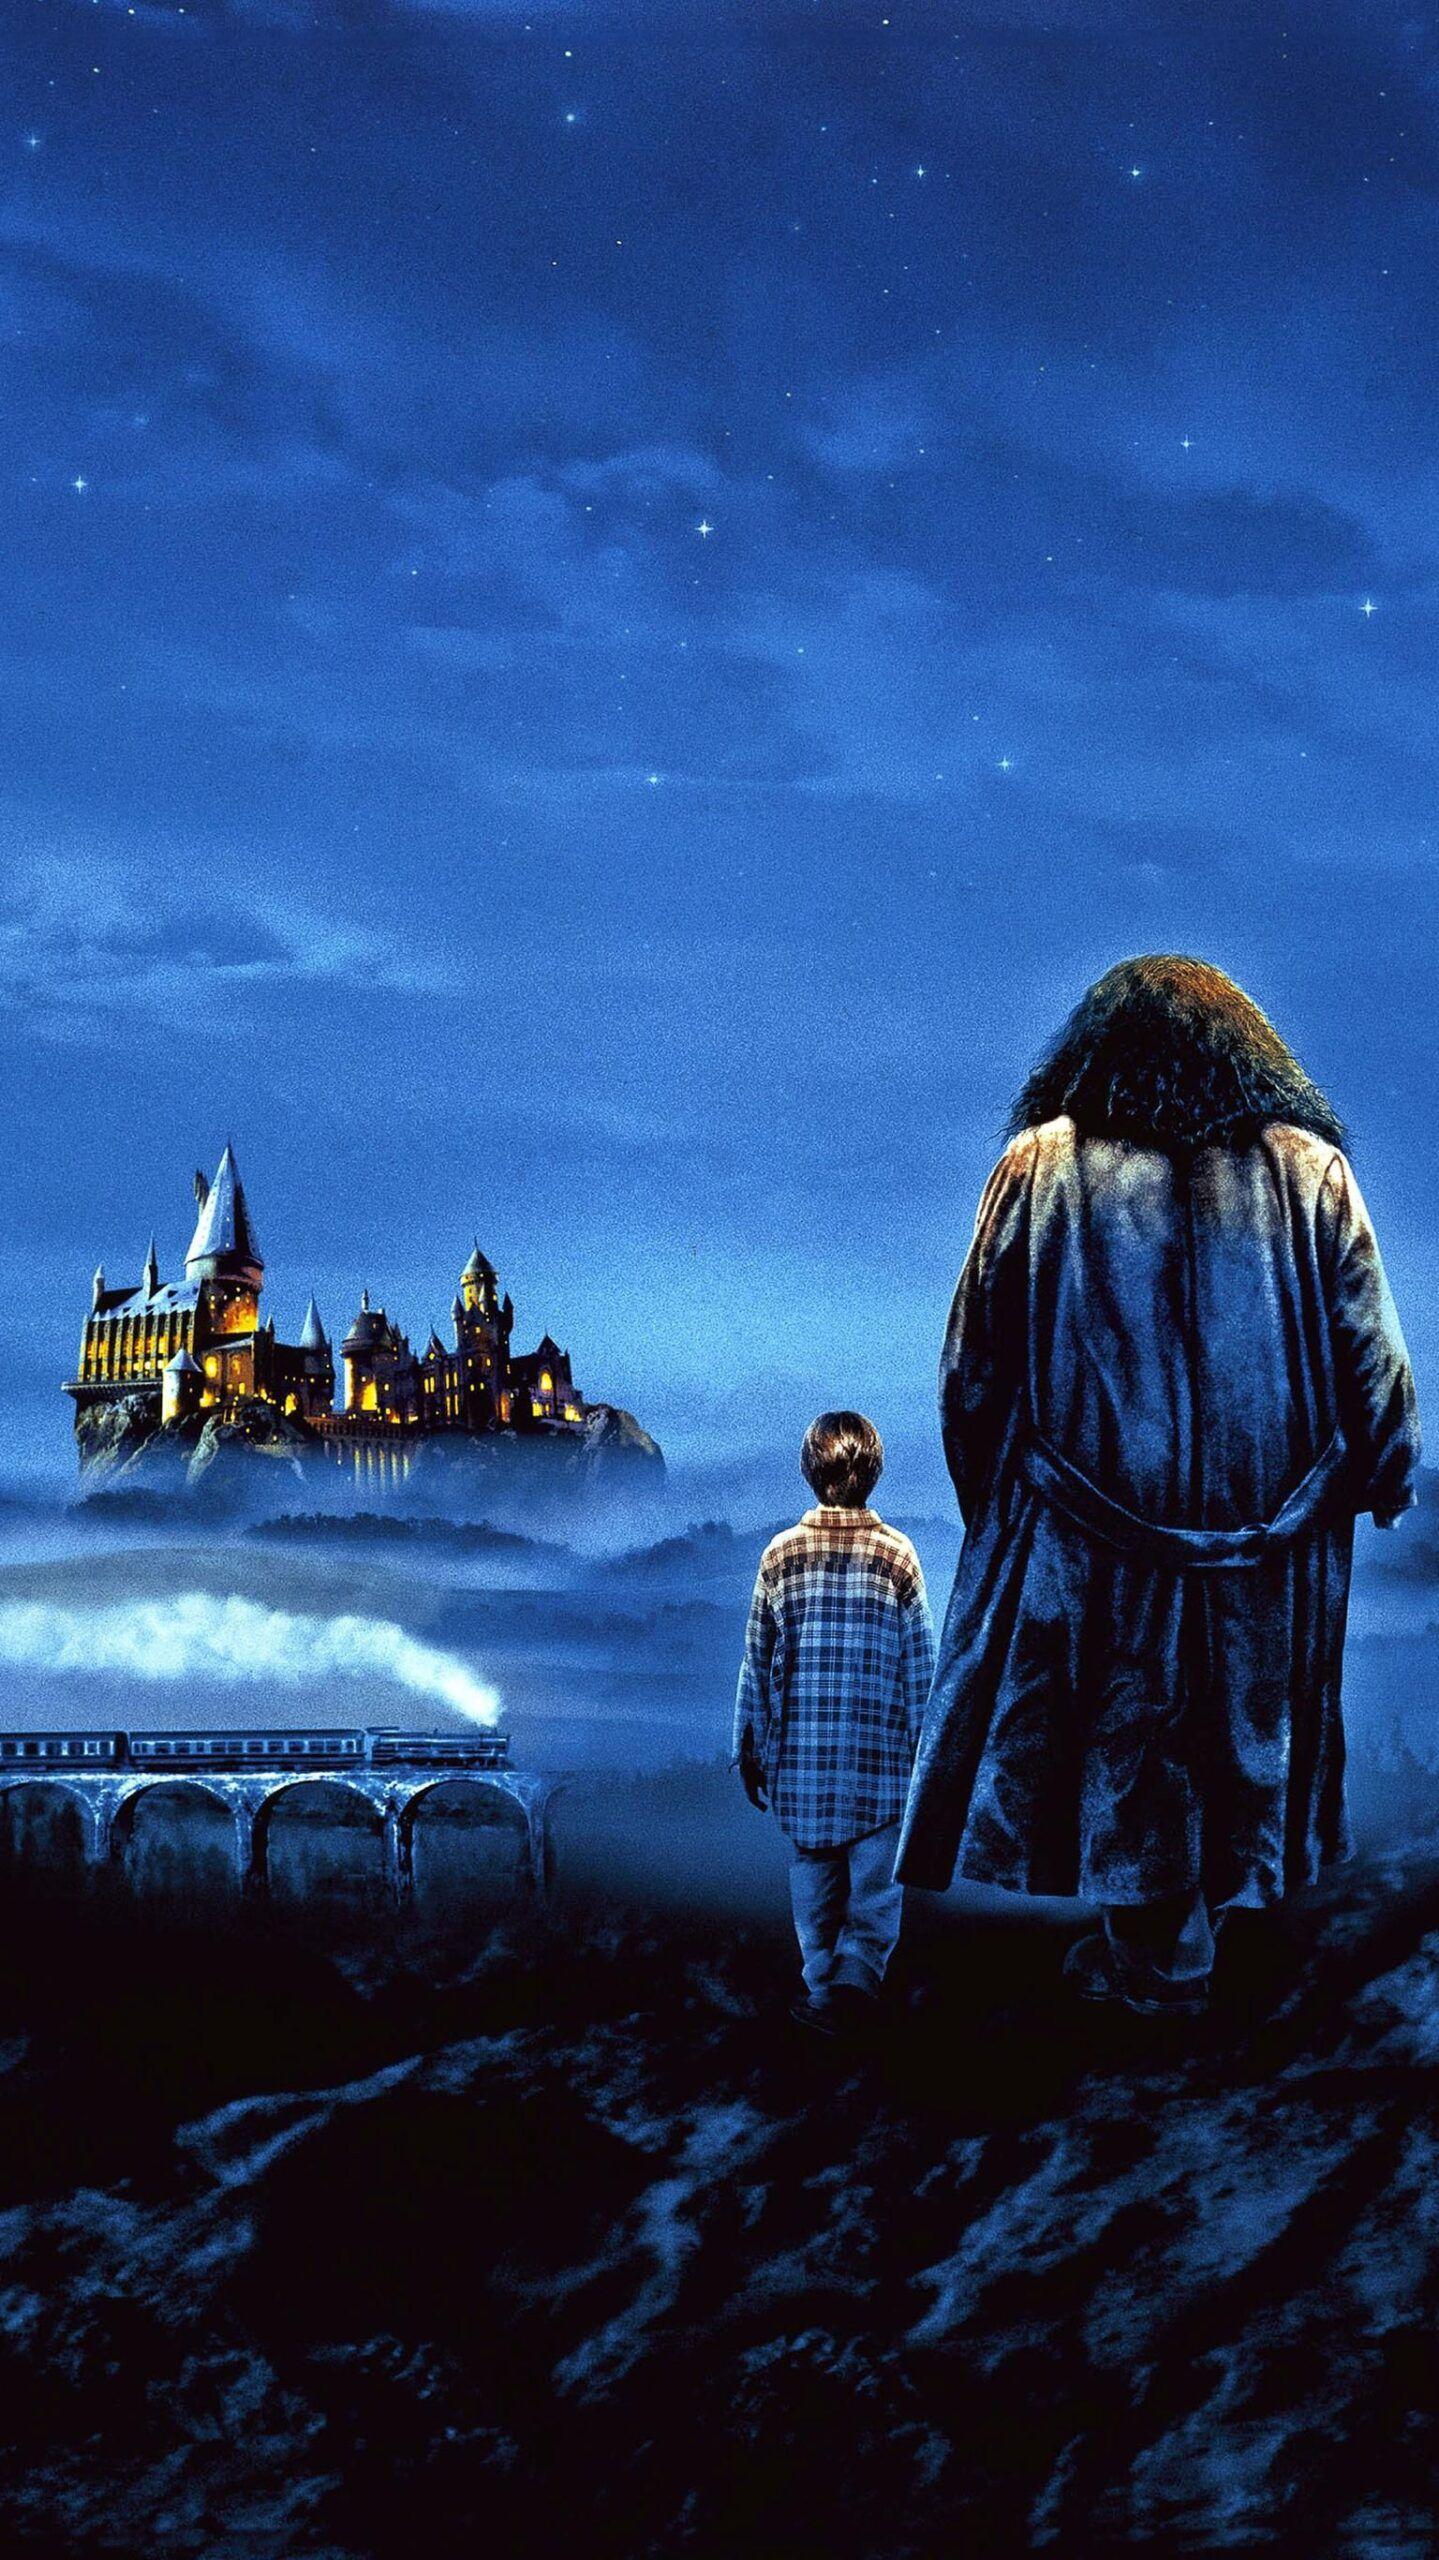 Harry Potter Ve Felsefe Tasi 2001 Telefon Duvar Kagidi Harry Potter Fantastik Yaratiklar Harry Potter Filmleri